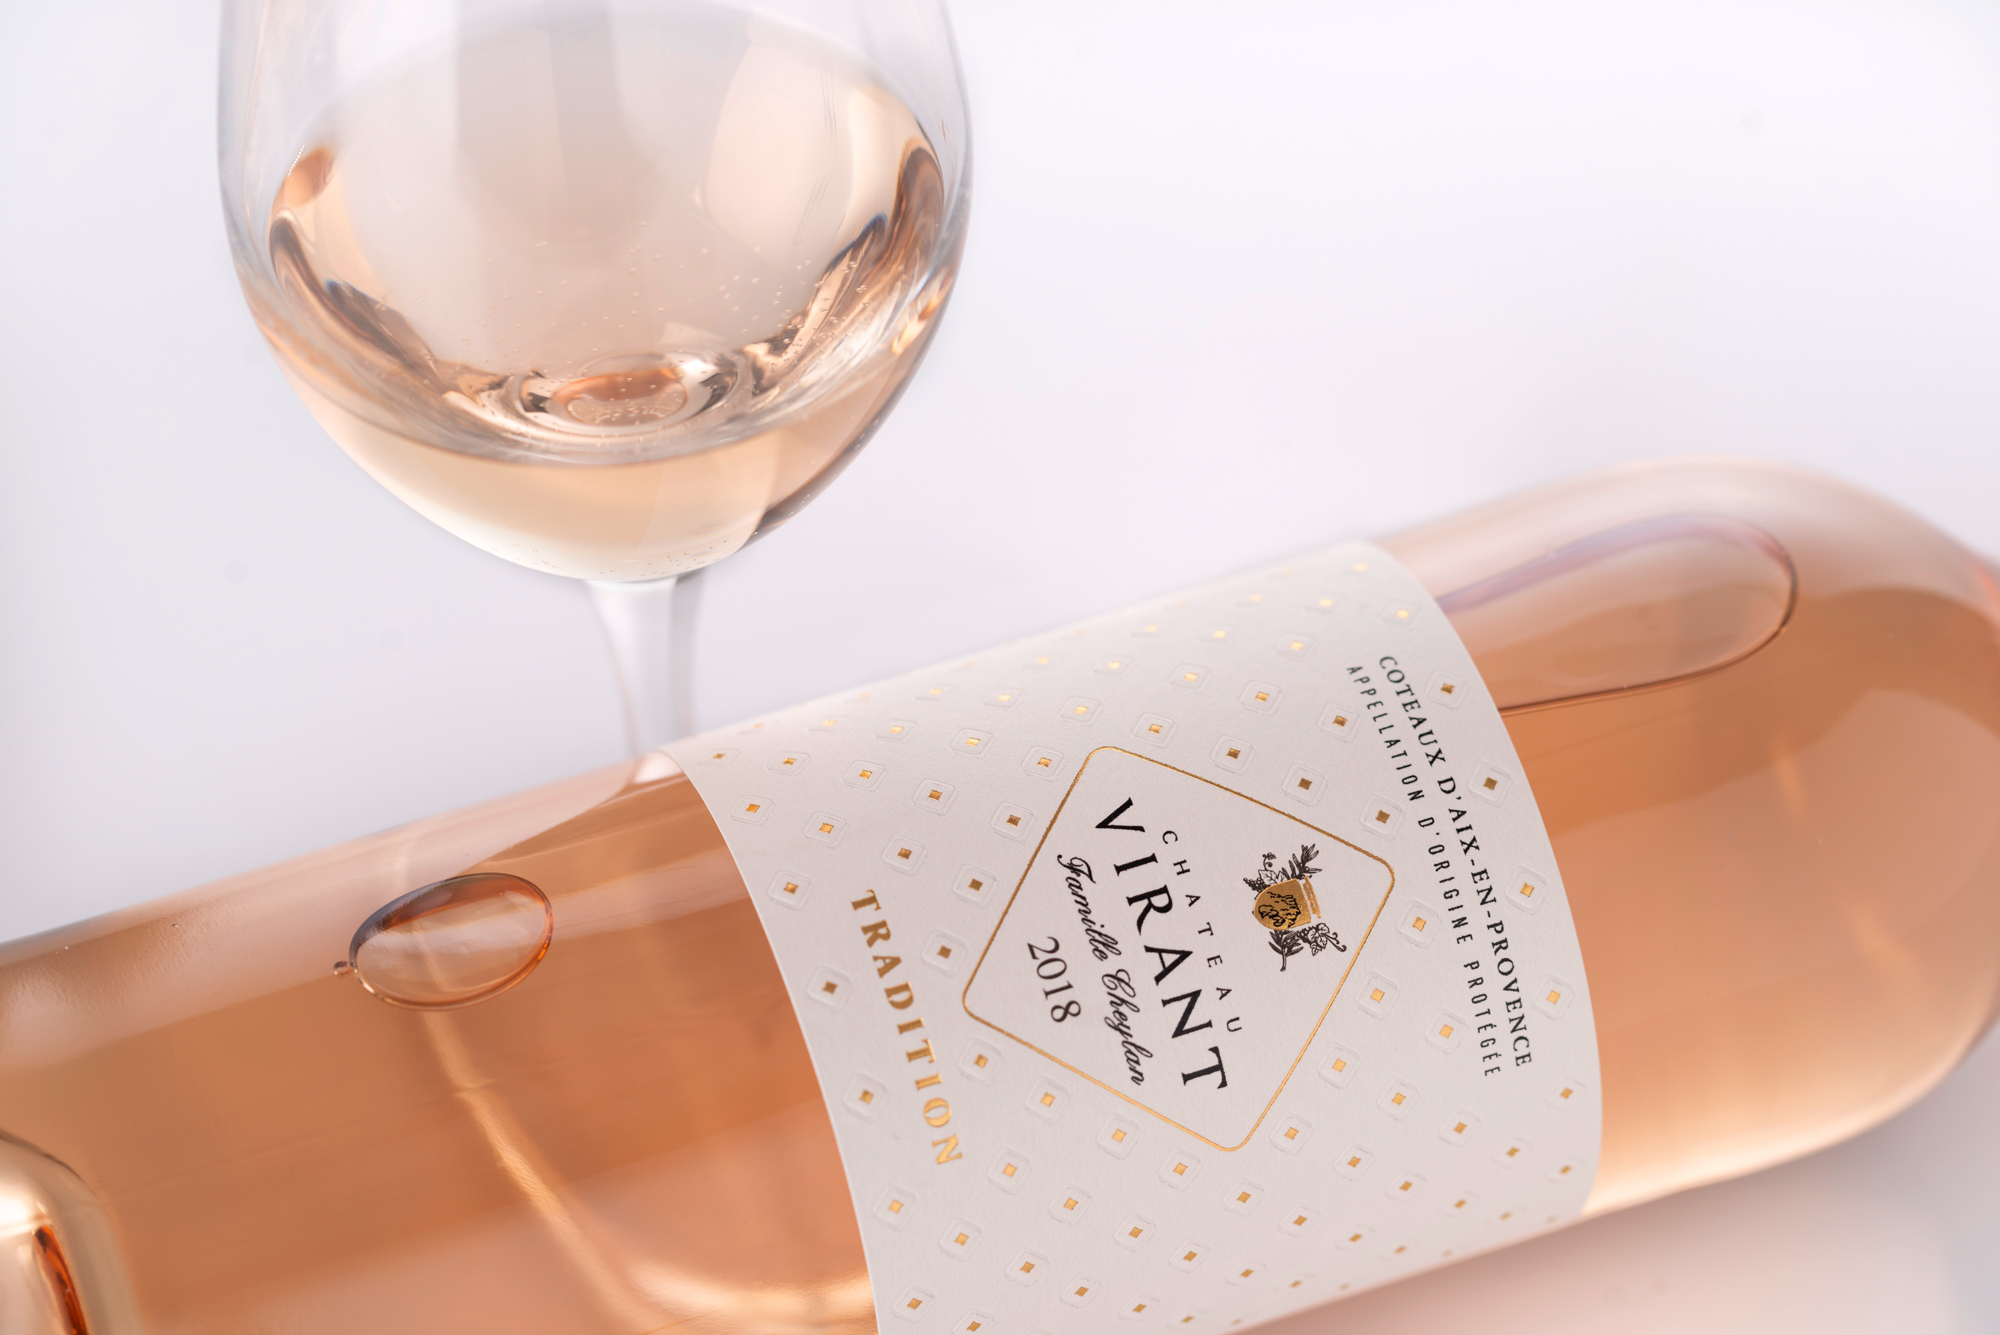 Chateau Virant_Tradition rosé 2